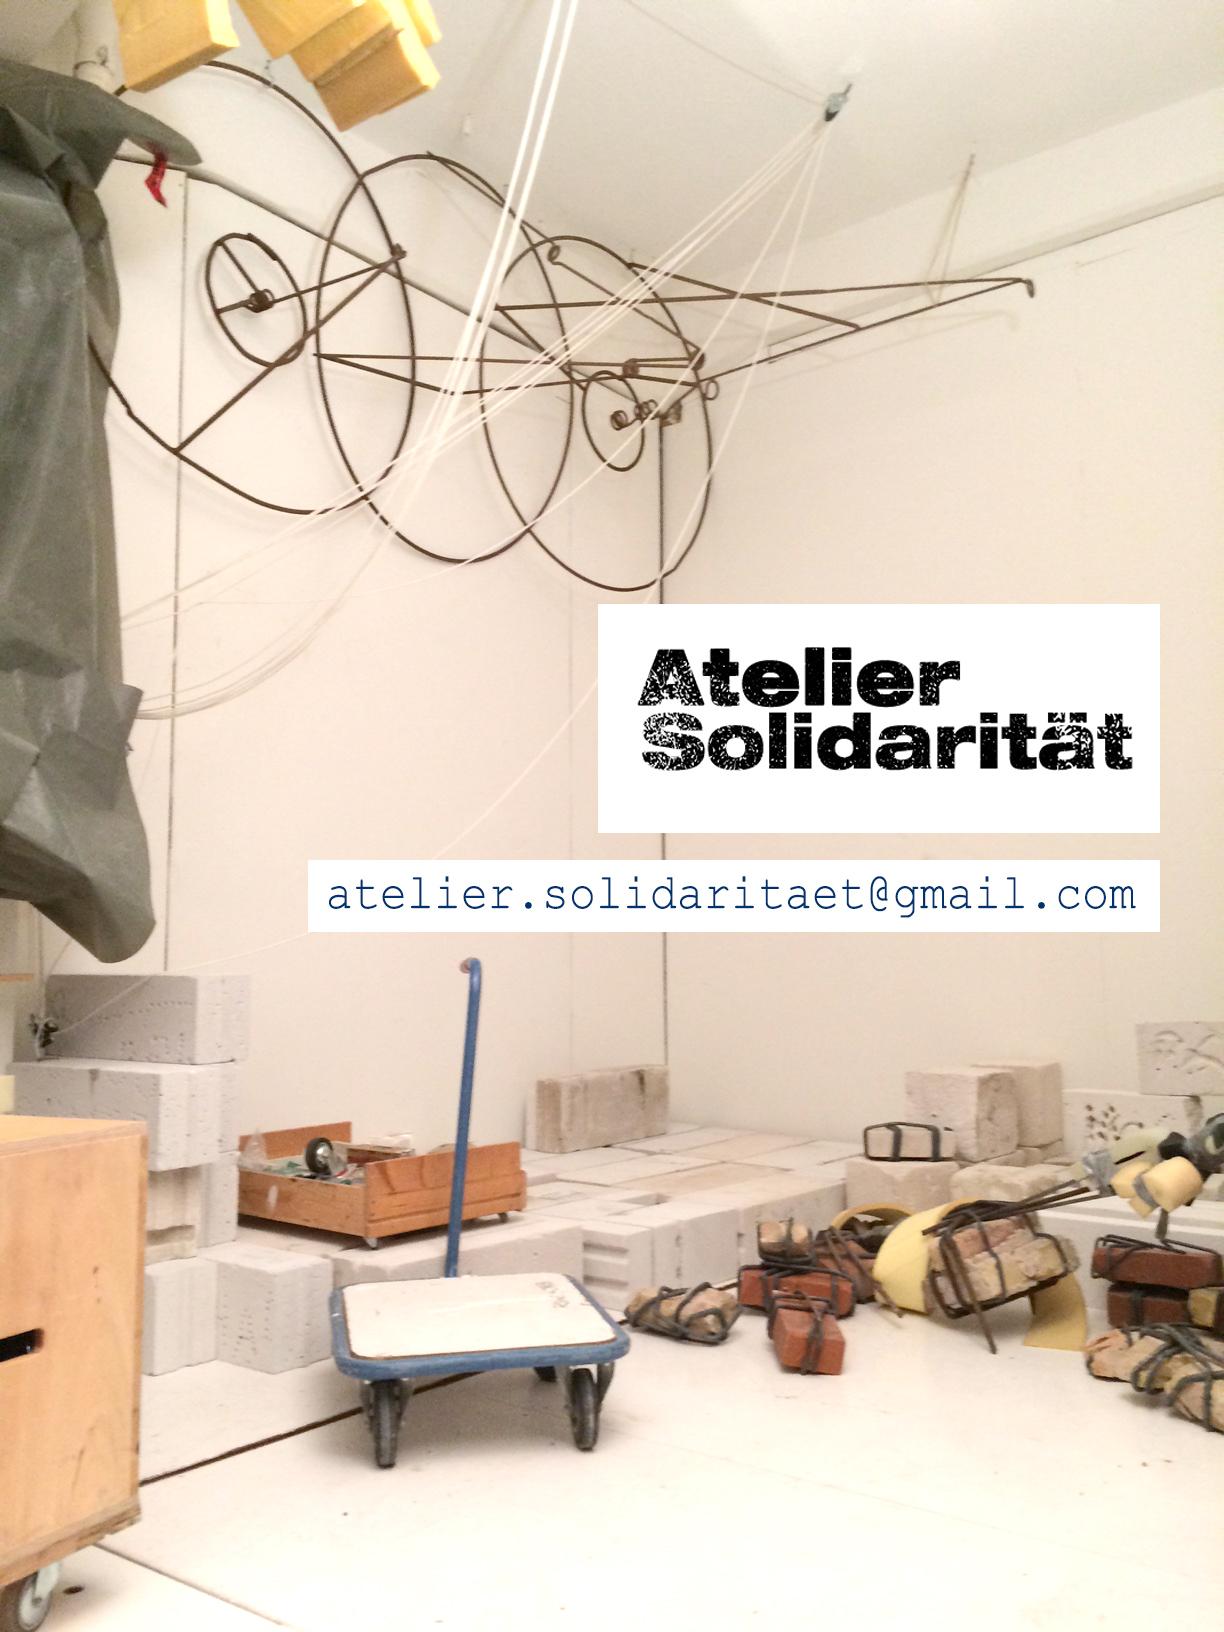 Atelier_Solidarität